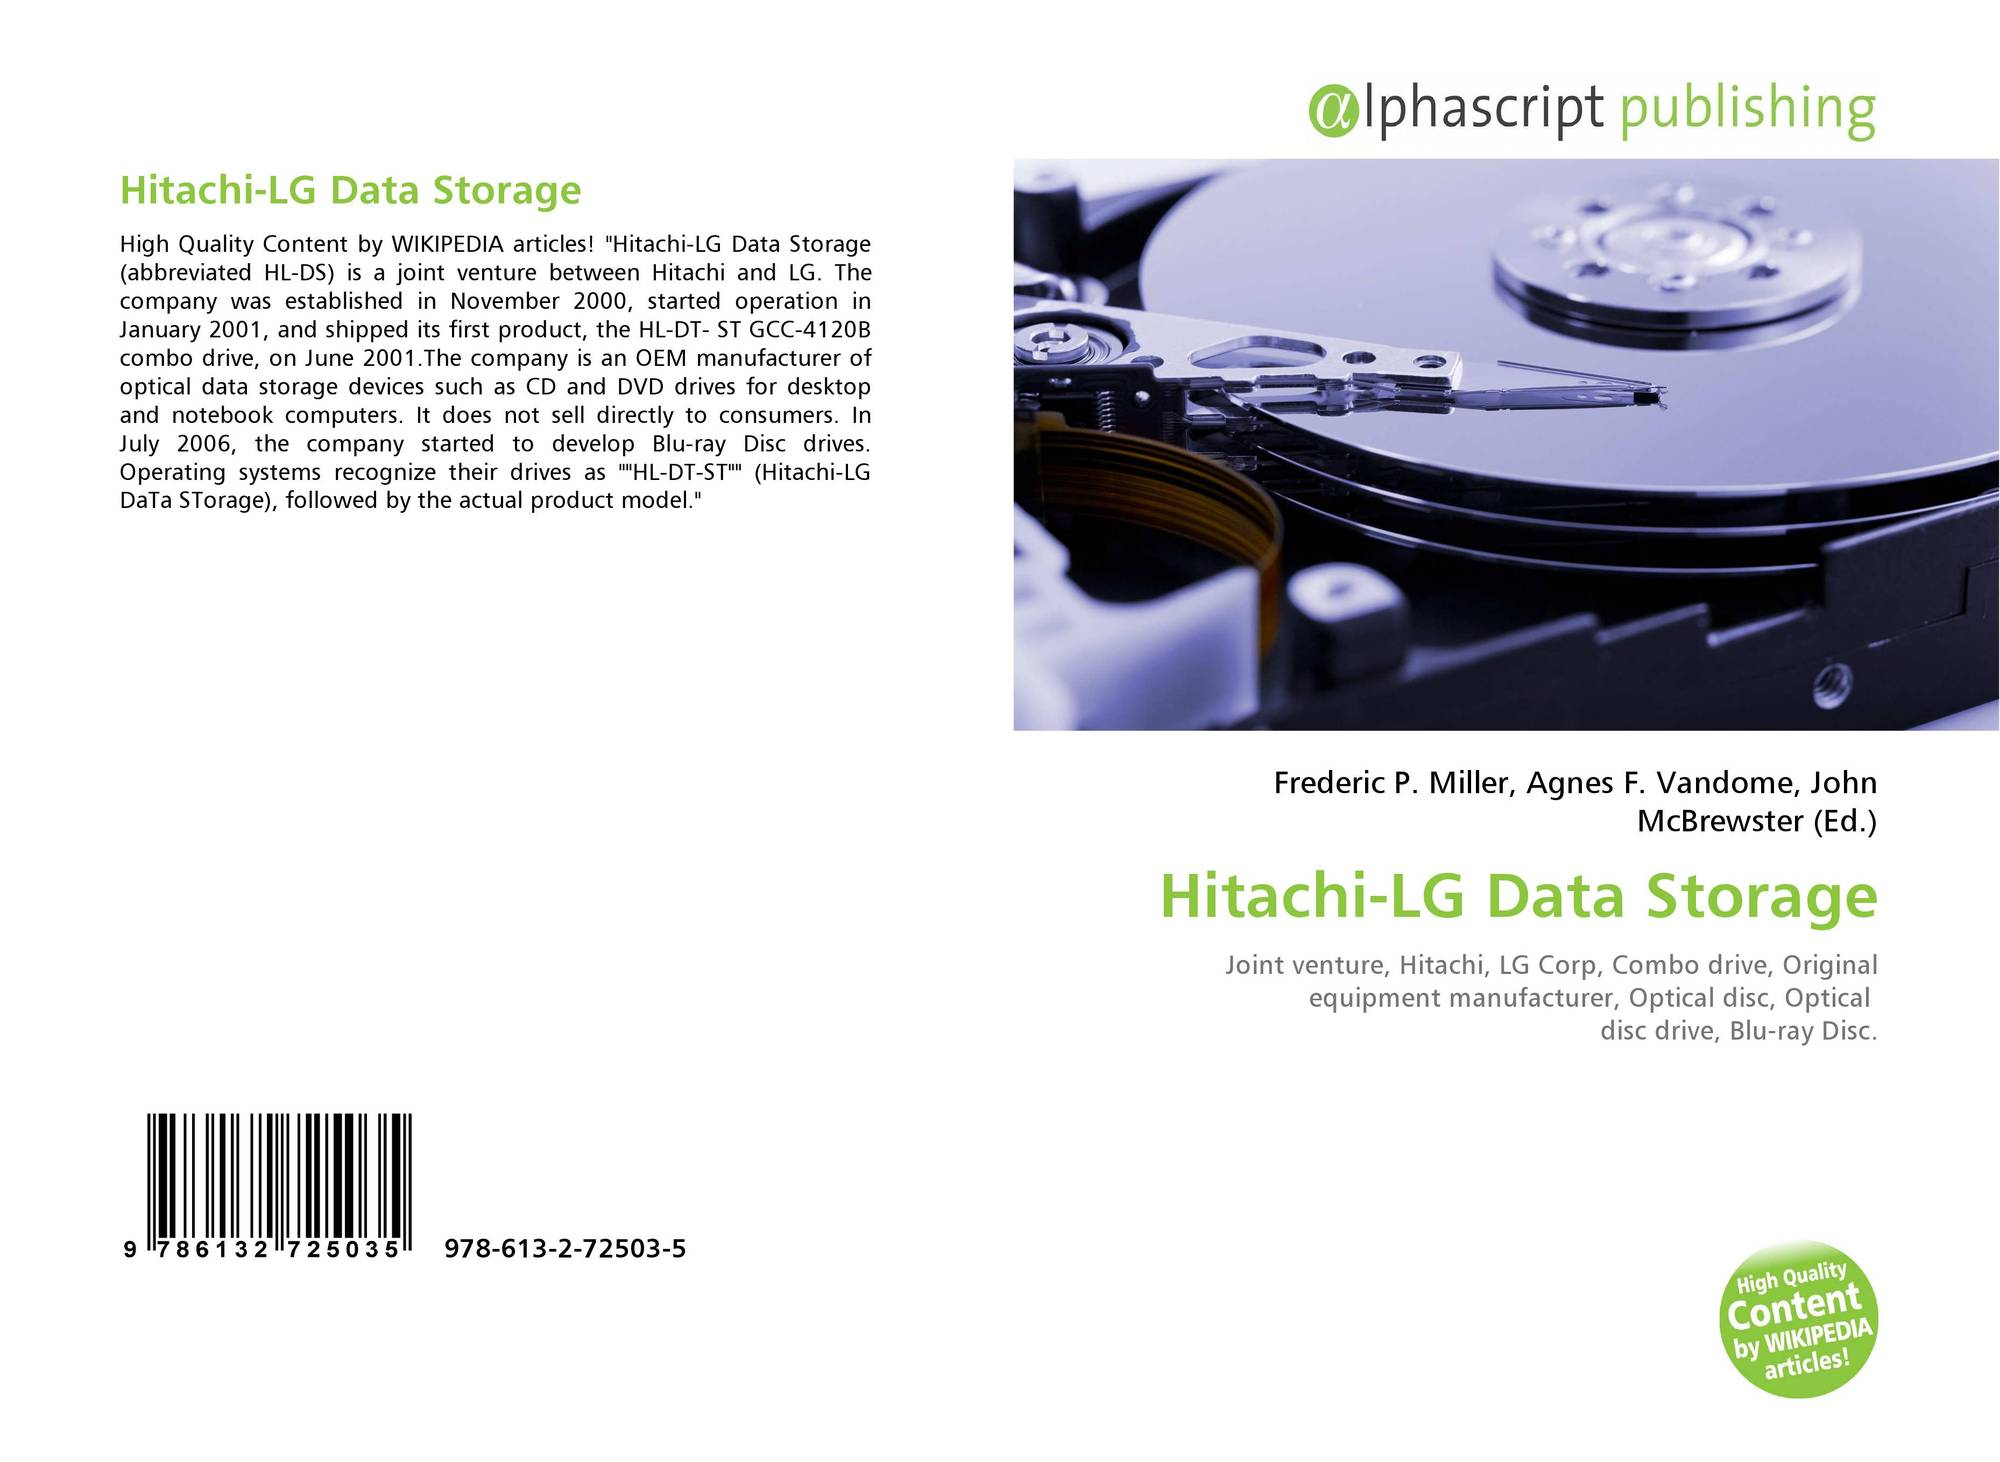 HL-DT-ST RW DVD GCC-4120B FREE DESCARGAR CONTROLADOR